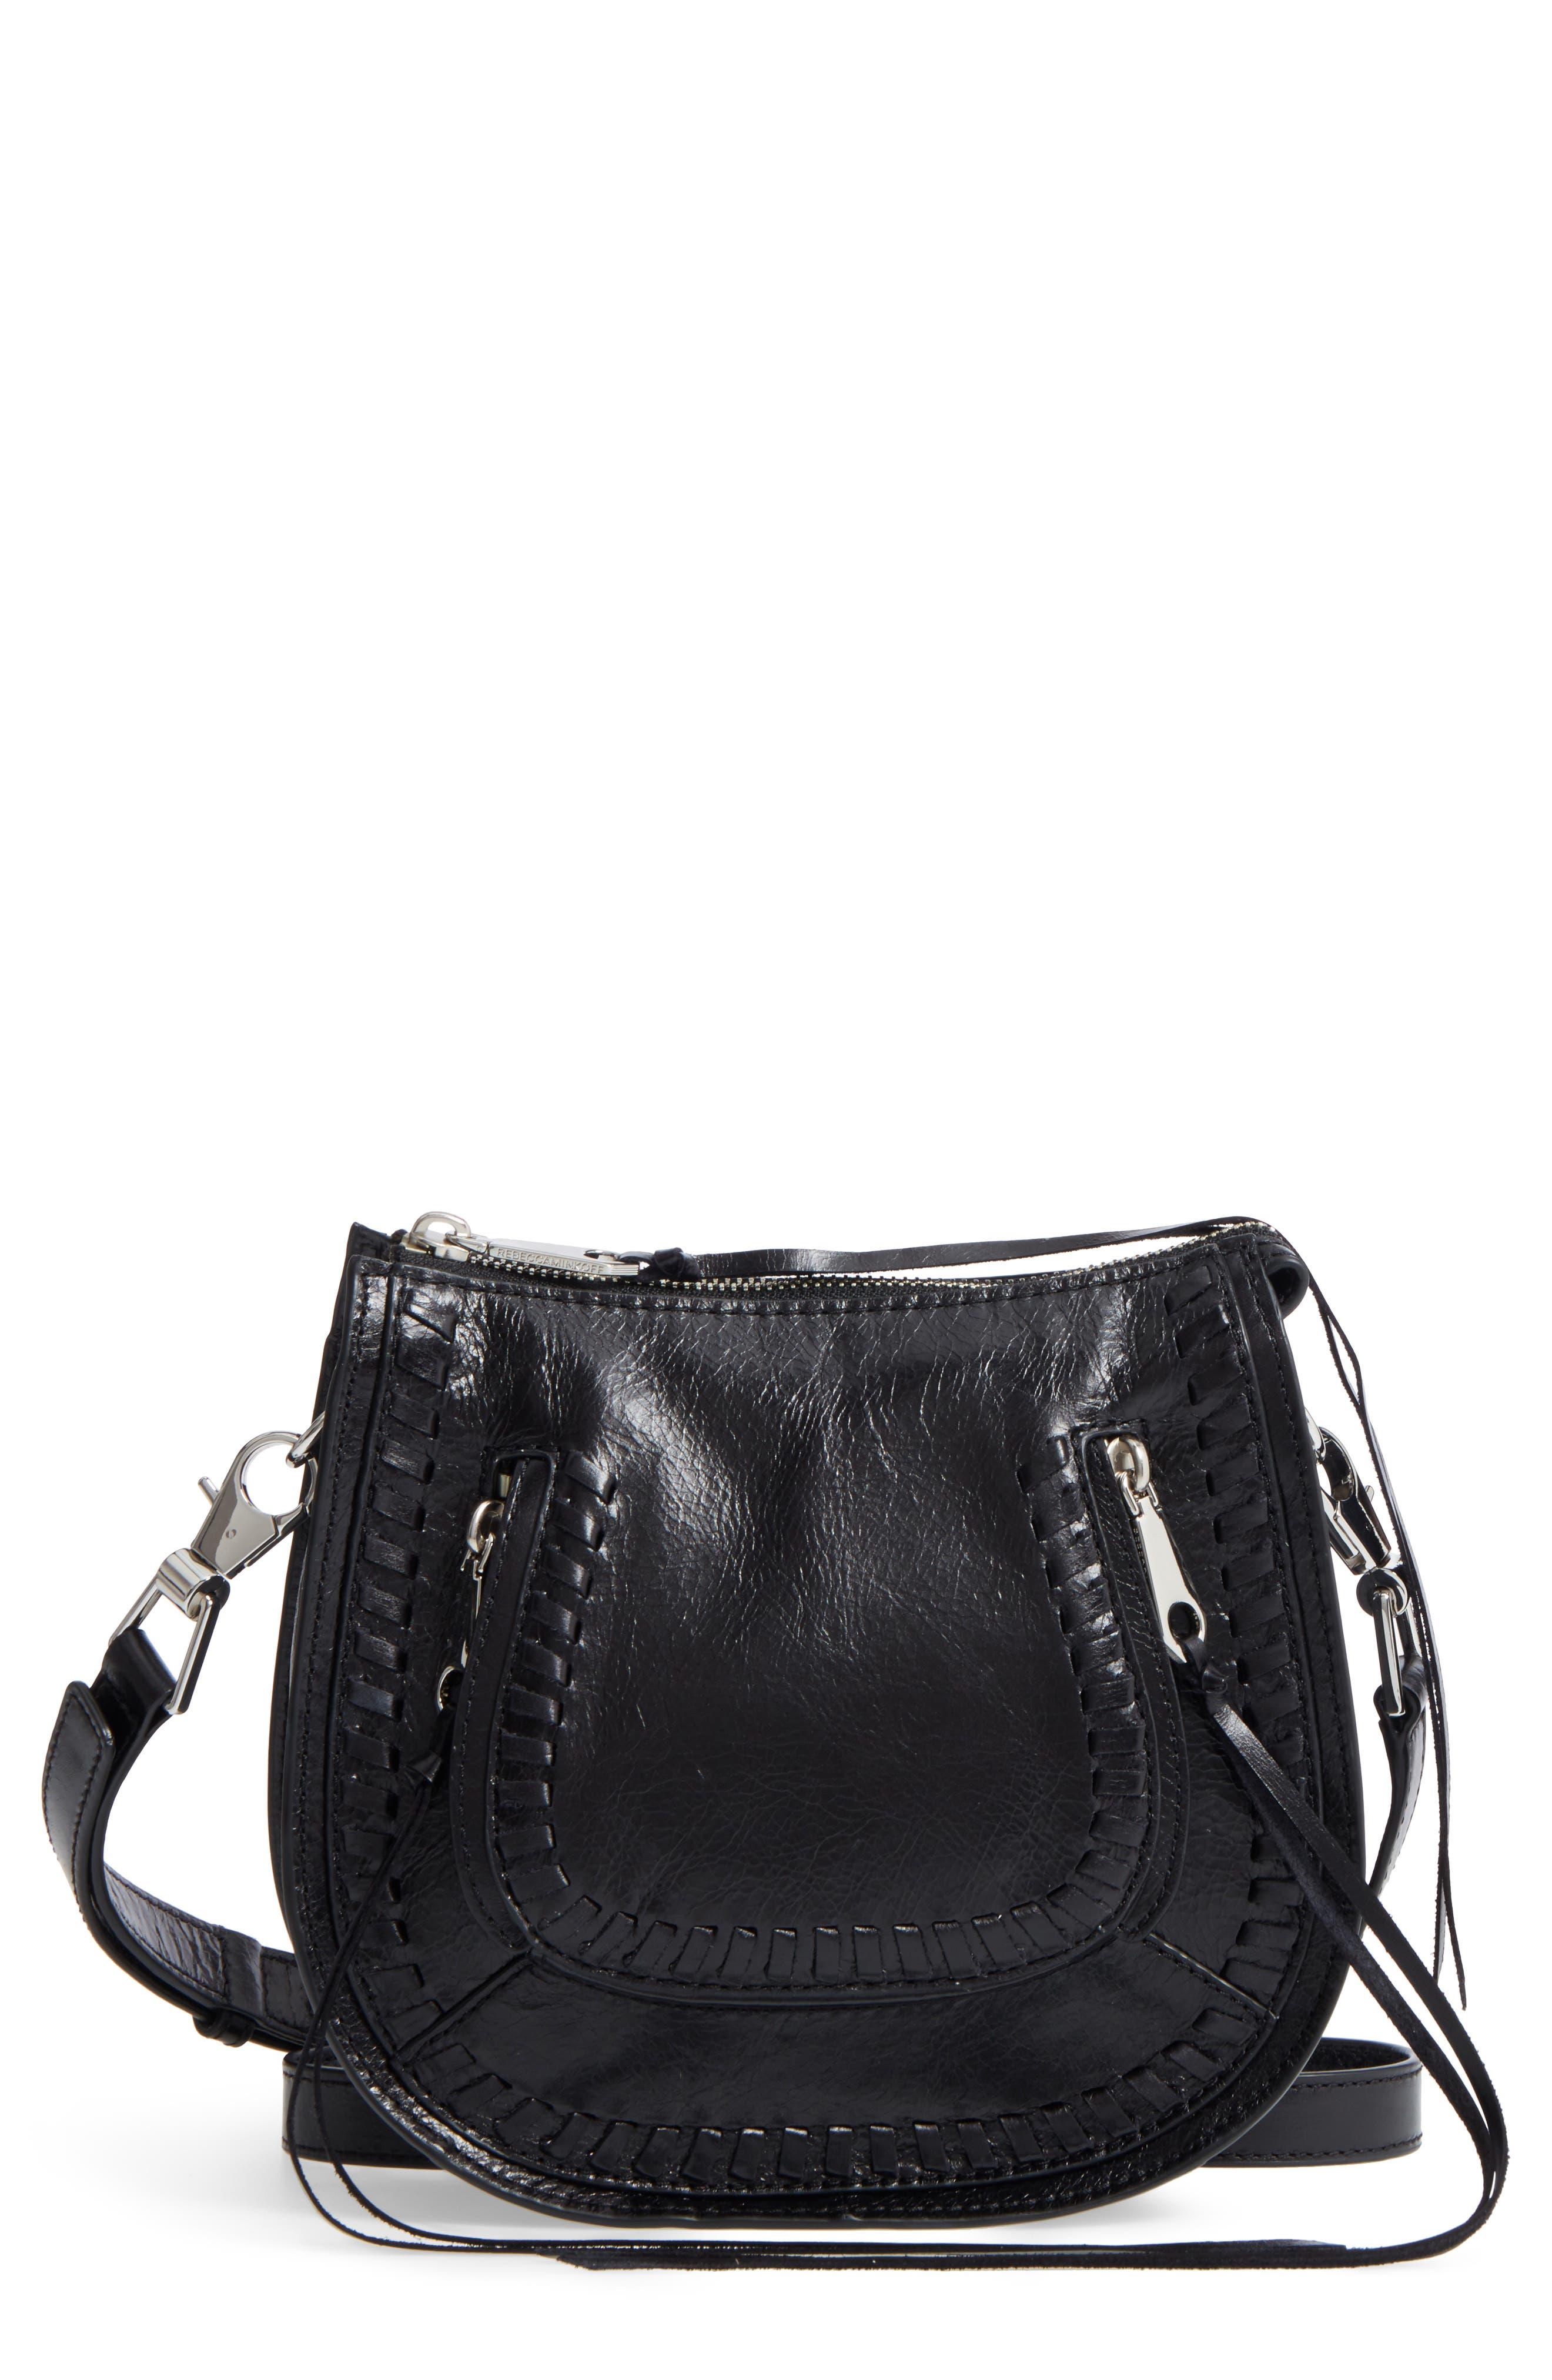 Alternate Image 1 Selected - Rebecca Minkoff Mini Vanity Leather Saddle Bag